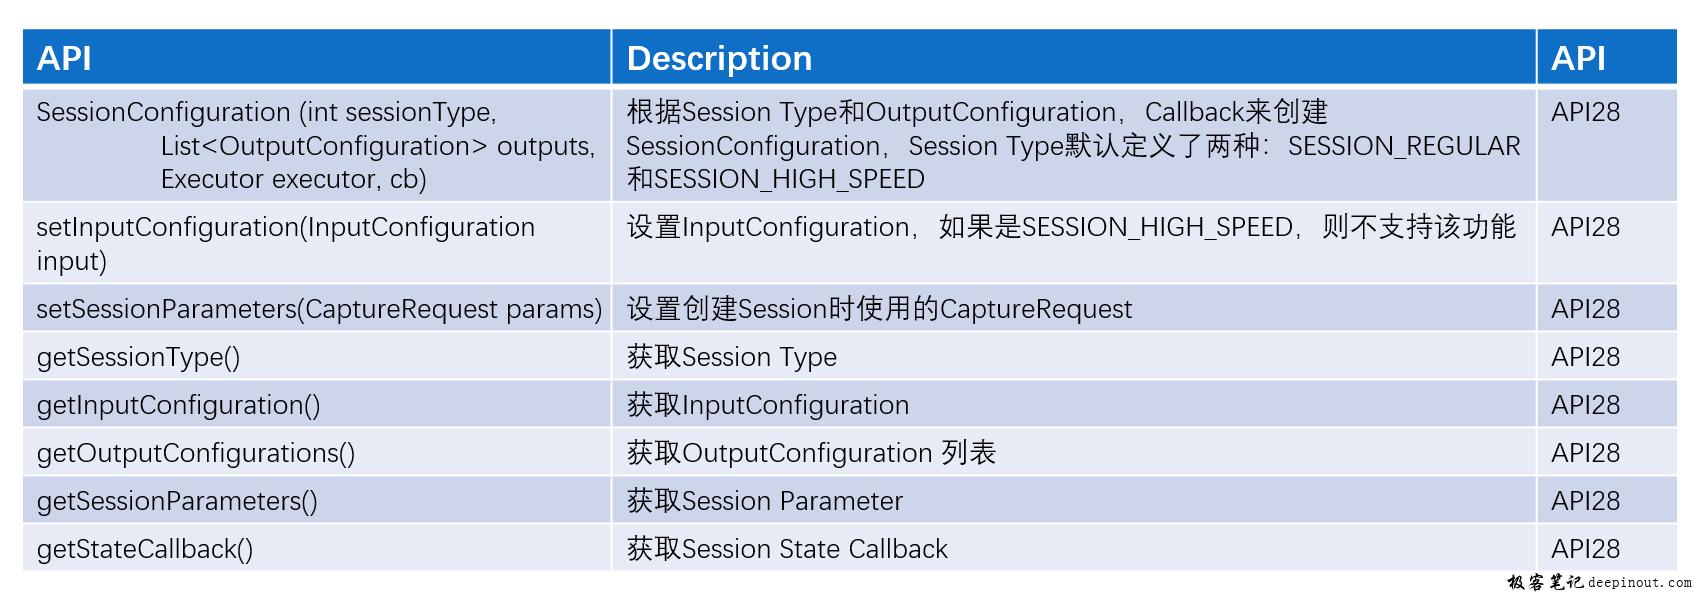 SessionConfiguration APIs概述